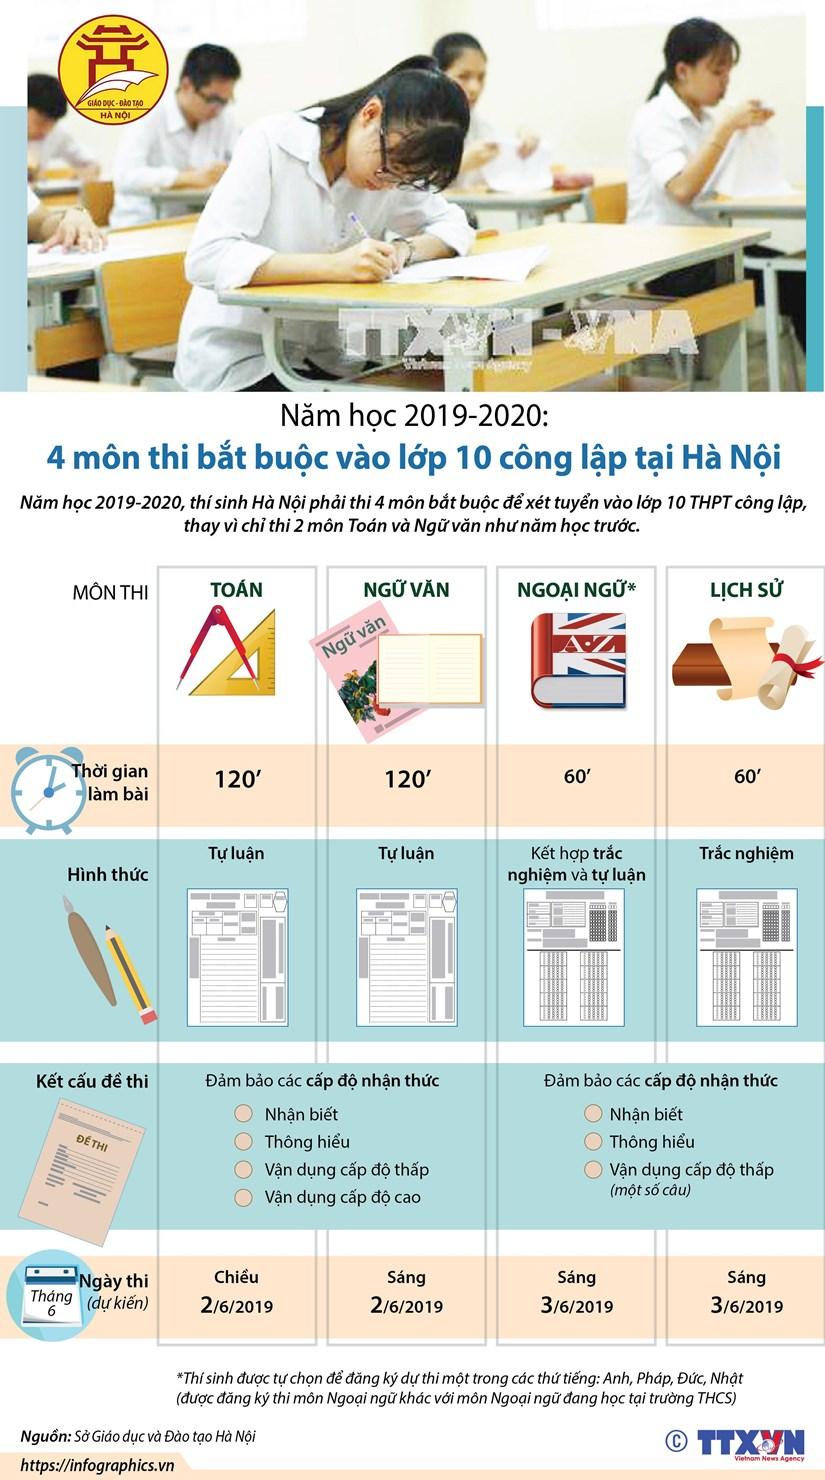 [Infographics] Bon mon thi bat buoc vao lop 10 cong lap tai Ha Noi hinh anh 1